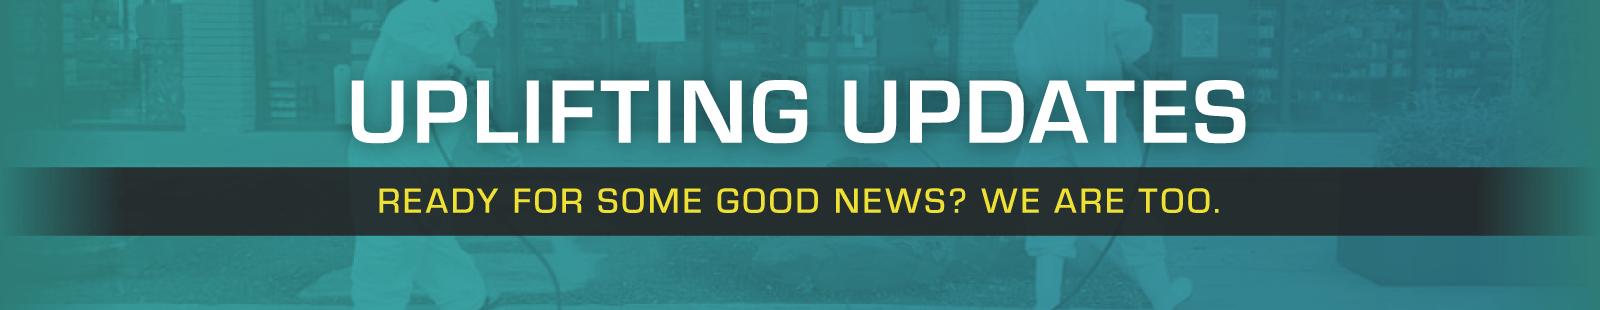 covid-19-good-news-desktop-3